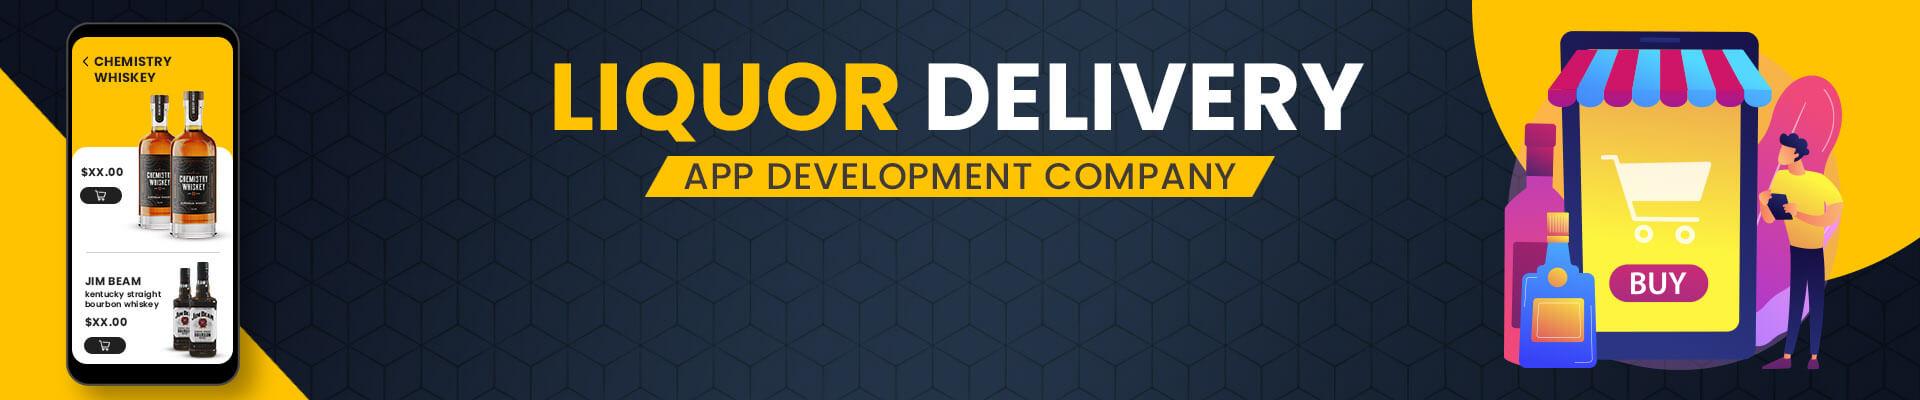 Best On-Demand Liquor Delivery App Development Company [2021]